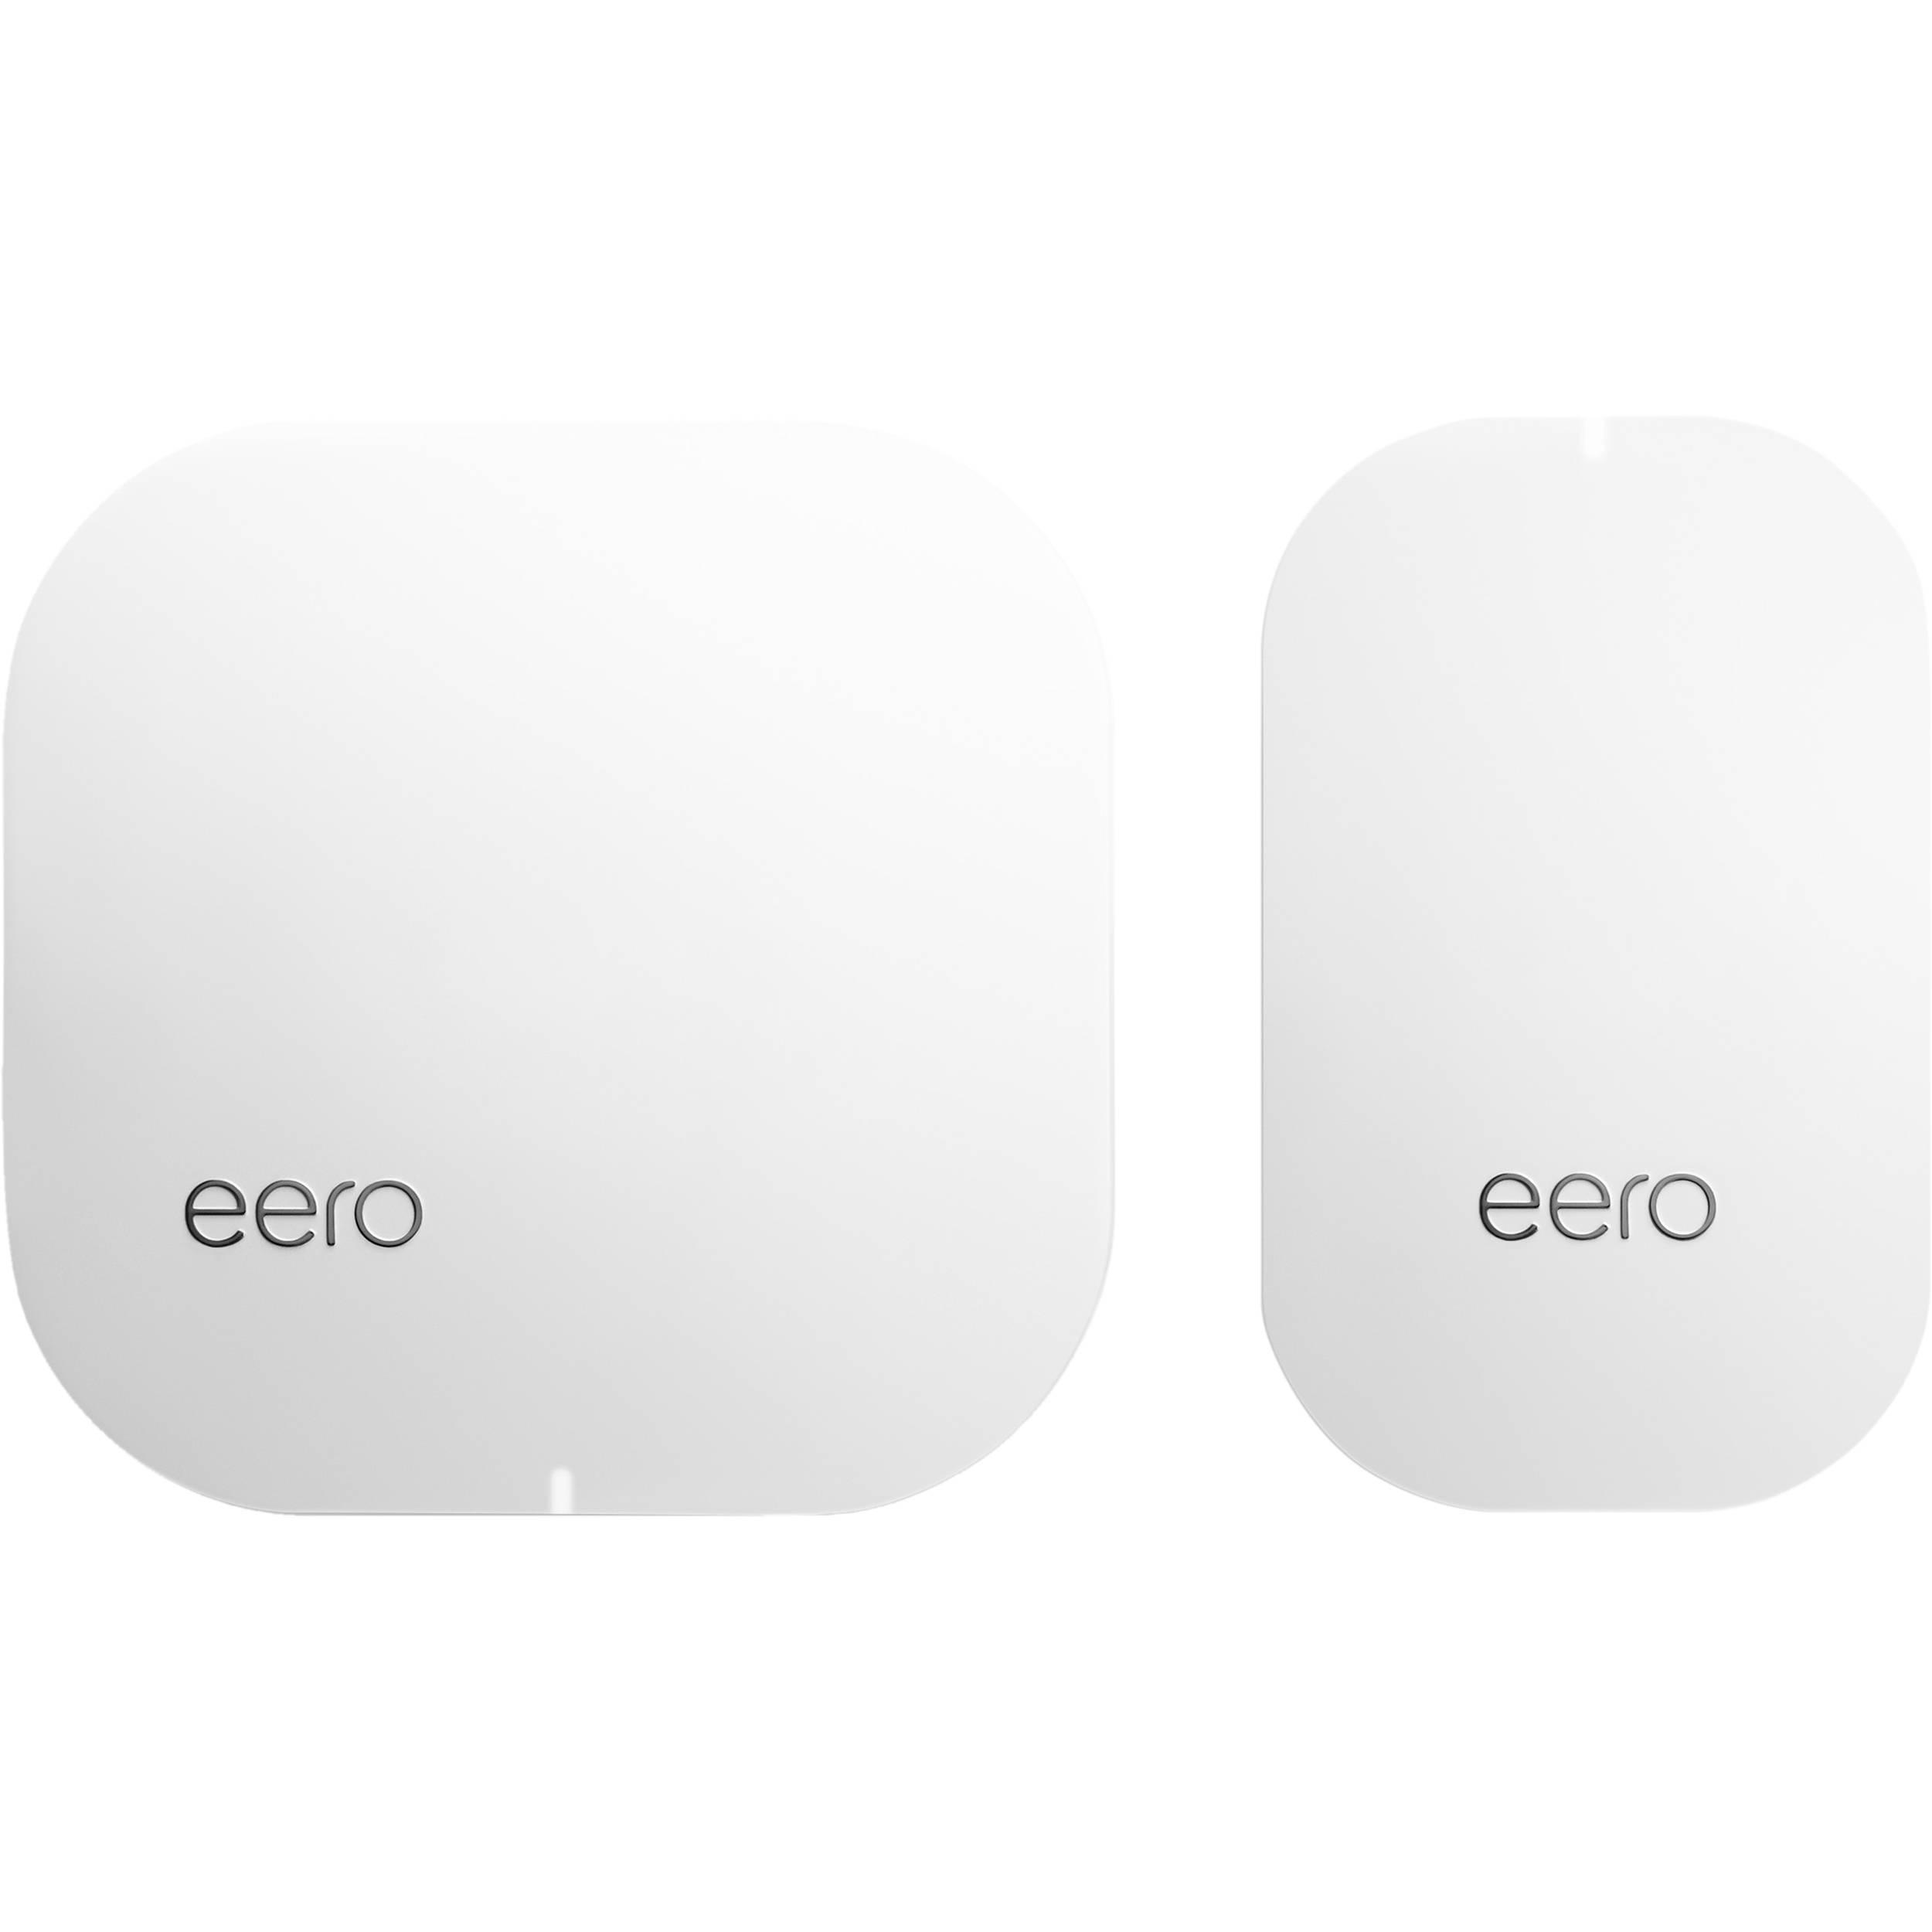 eero Home Wi-Fi System (1 eero / 1 Beacon)